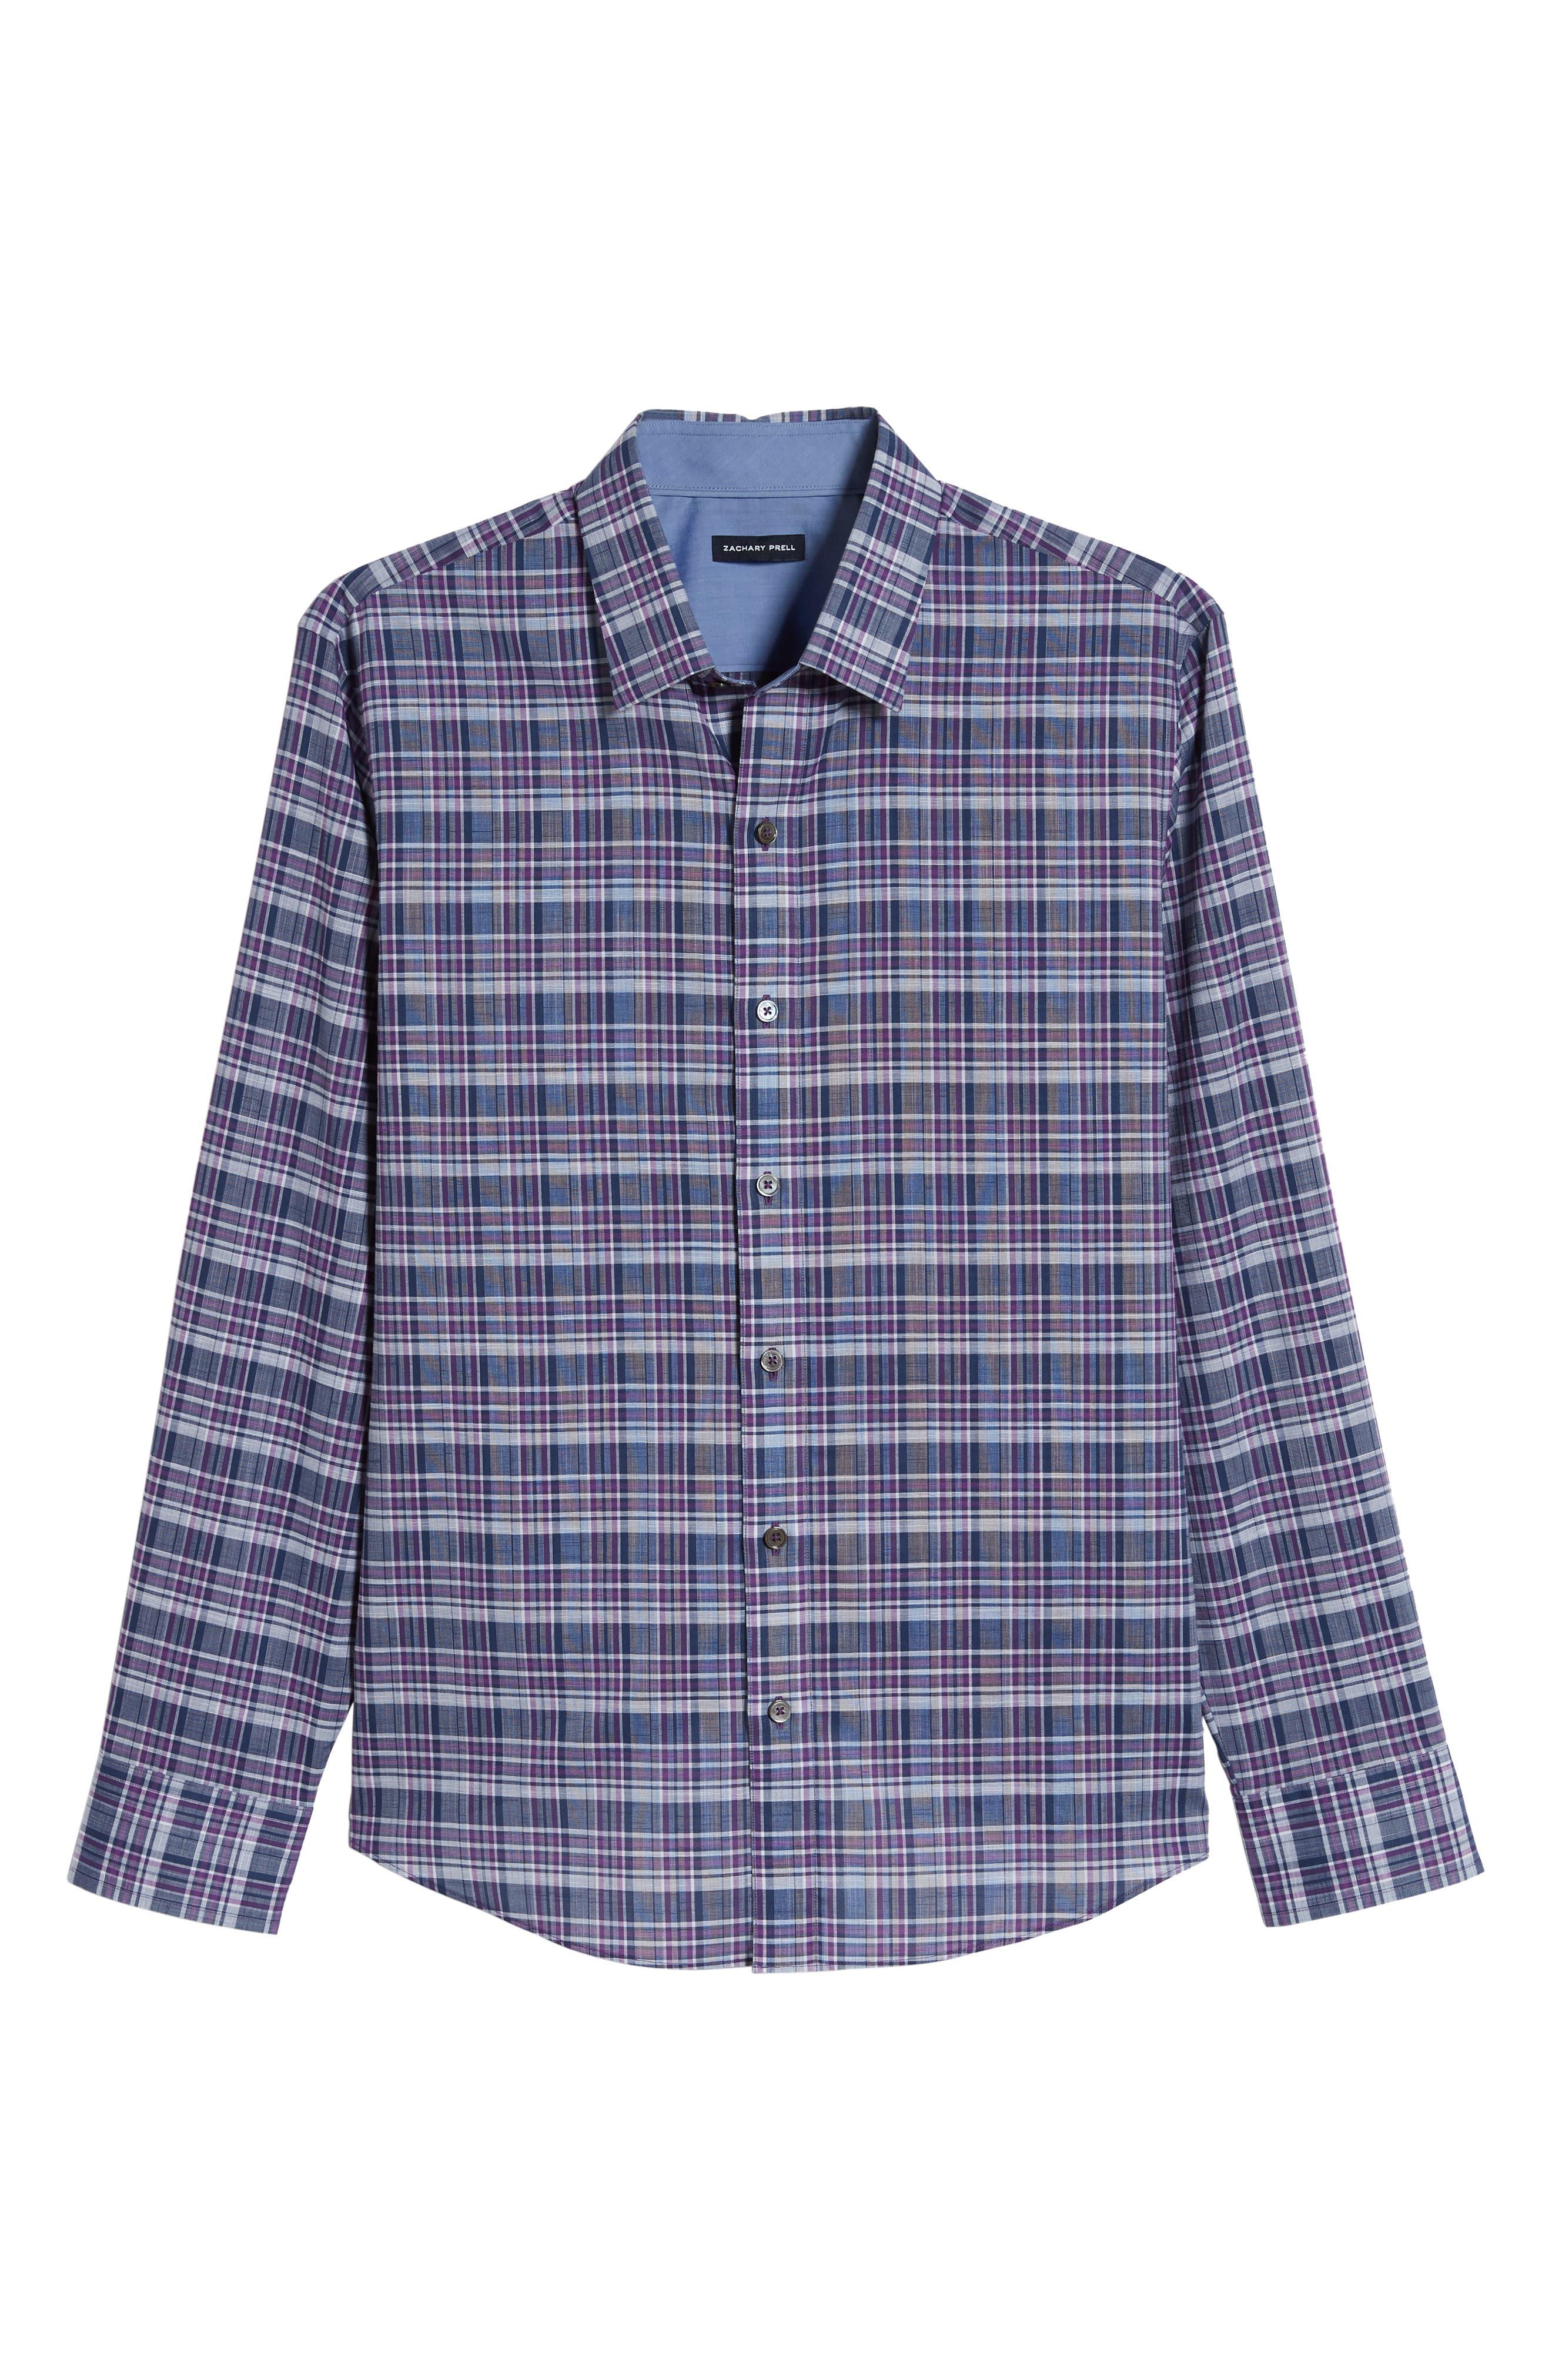 ZACHARY PRELL, Caro Regular Fit Sport Shirt, Alternate thumbnail 5, color, PURPLE